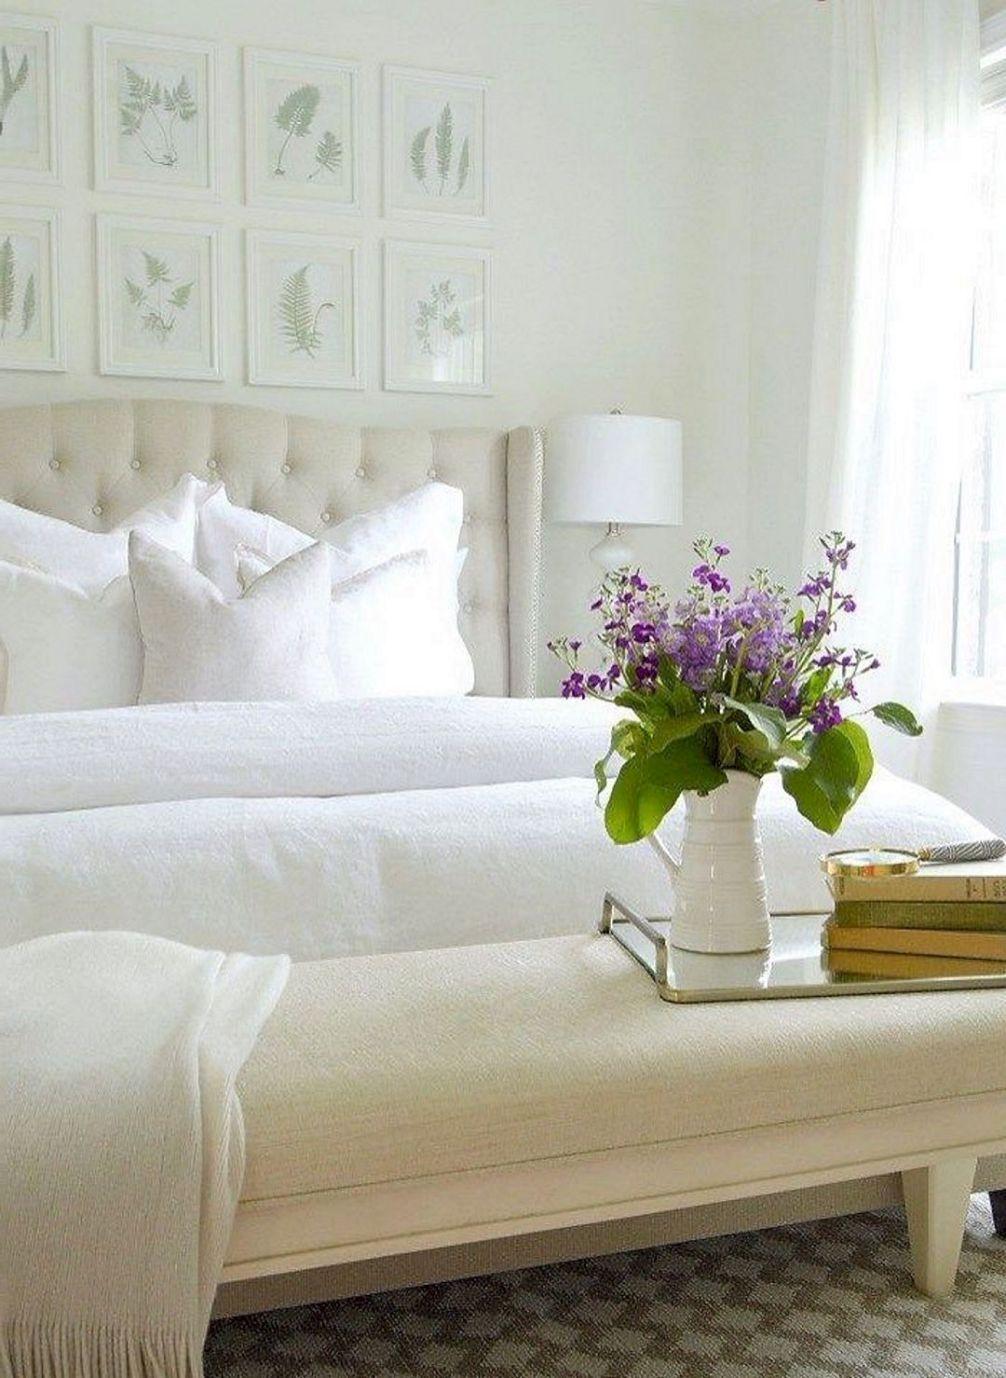 Modern Romantic Bedroom Designs: 137 DIY Rustic And Romantic Master Bedroom Ideas On A